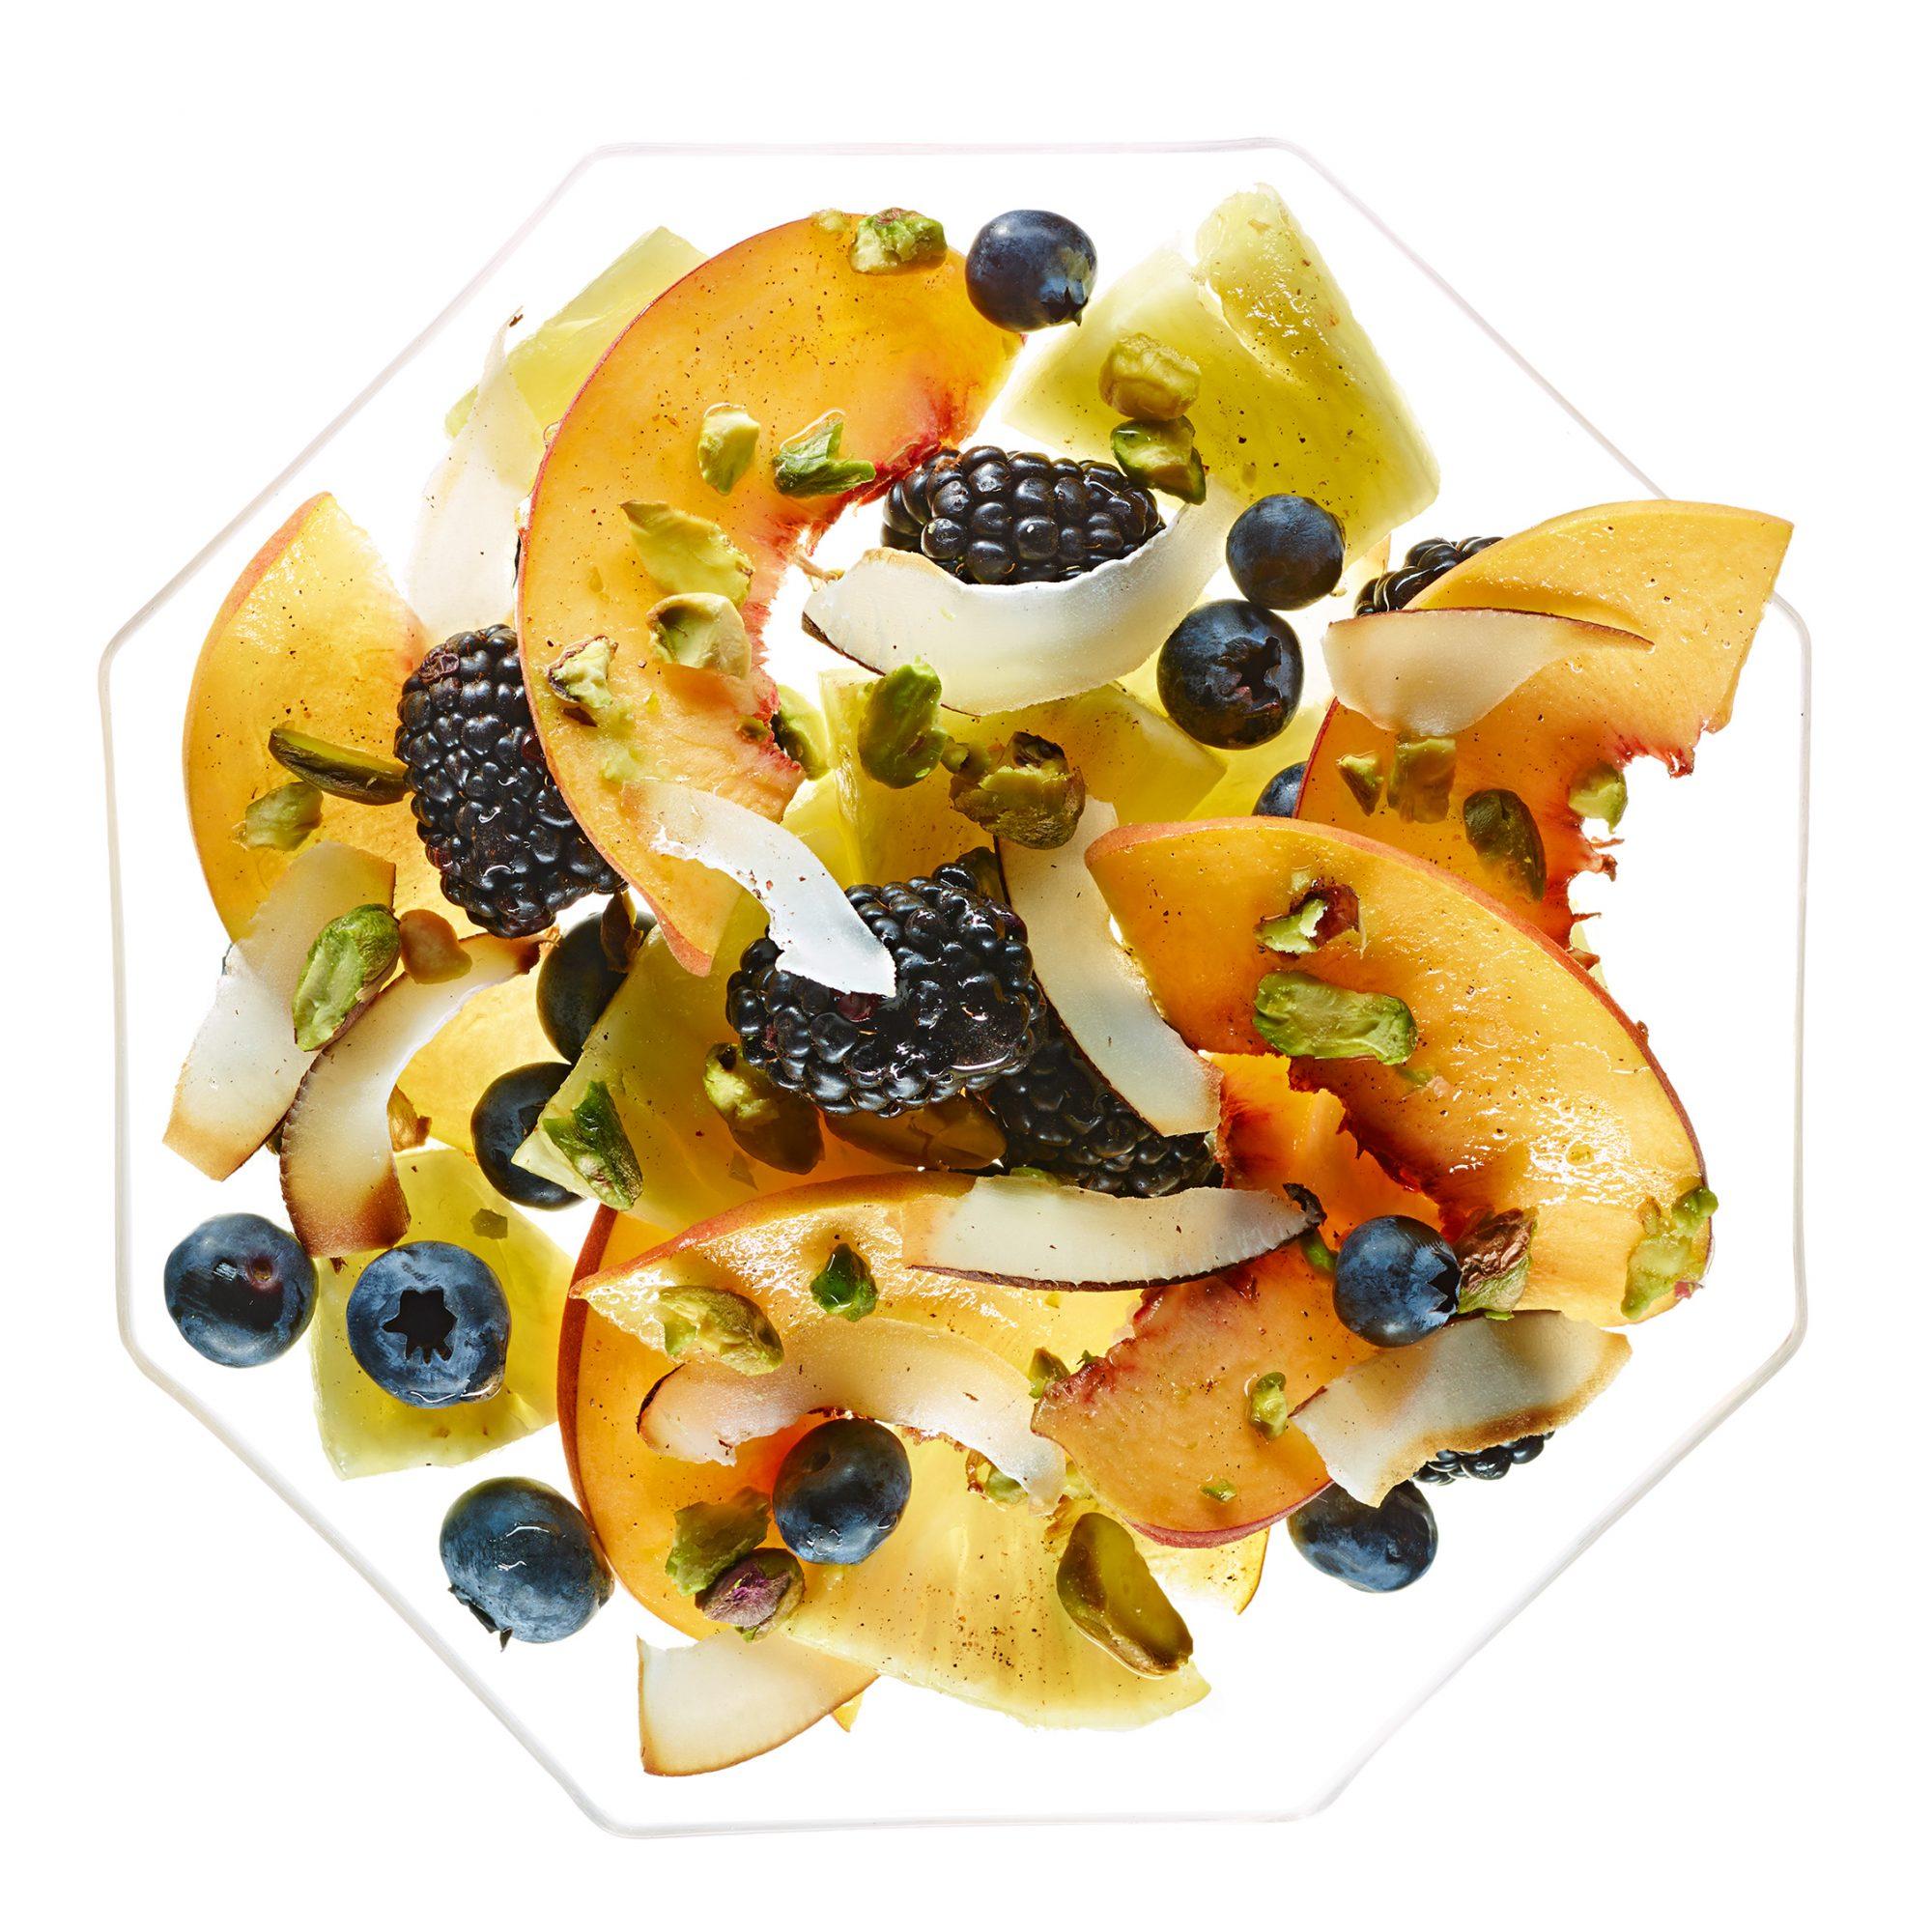 Berry-Peach Salad with Cardamom, Coconut & Pistachios